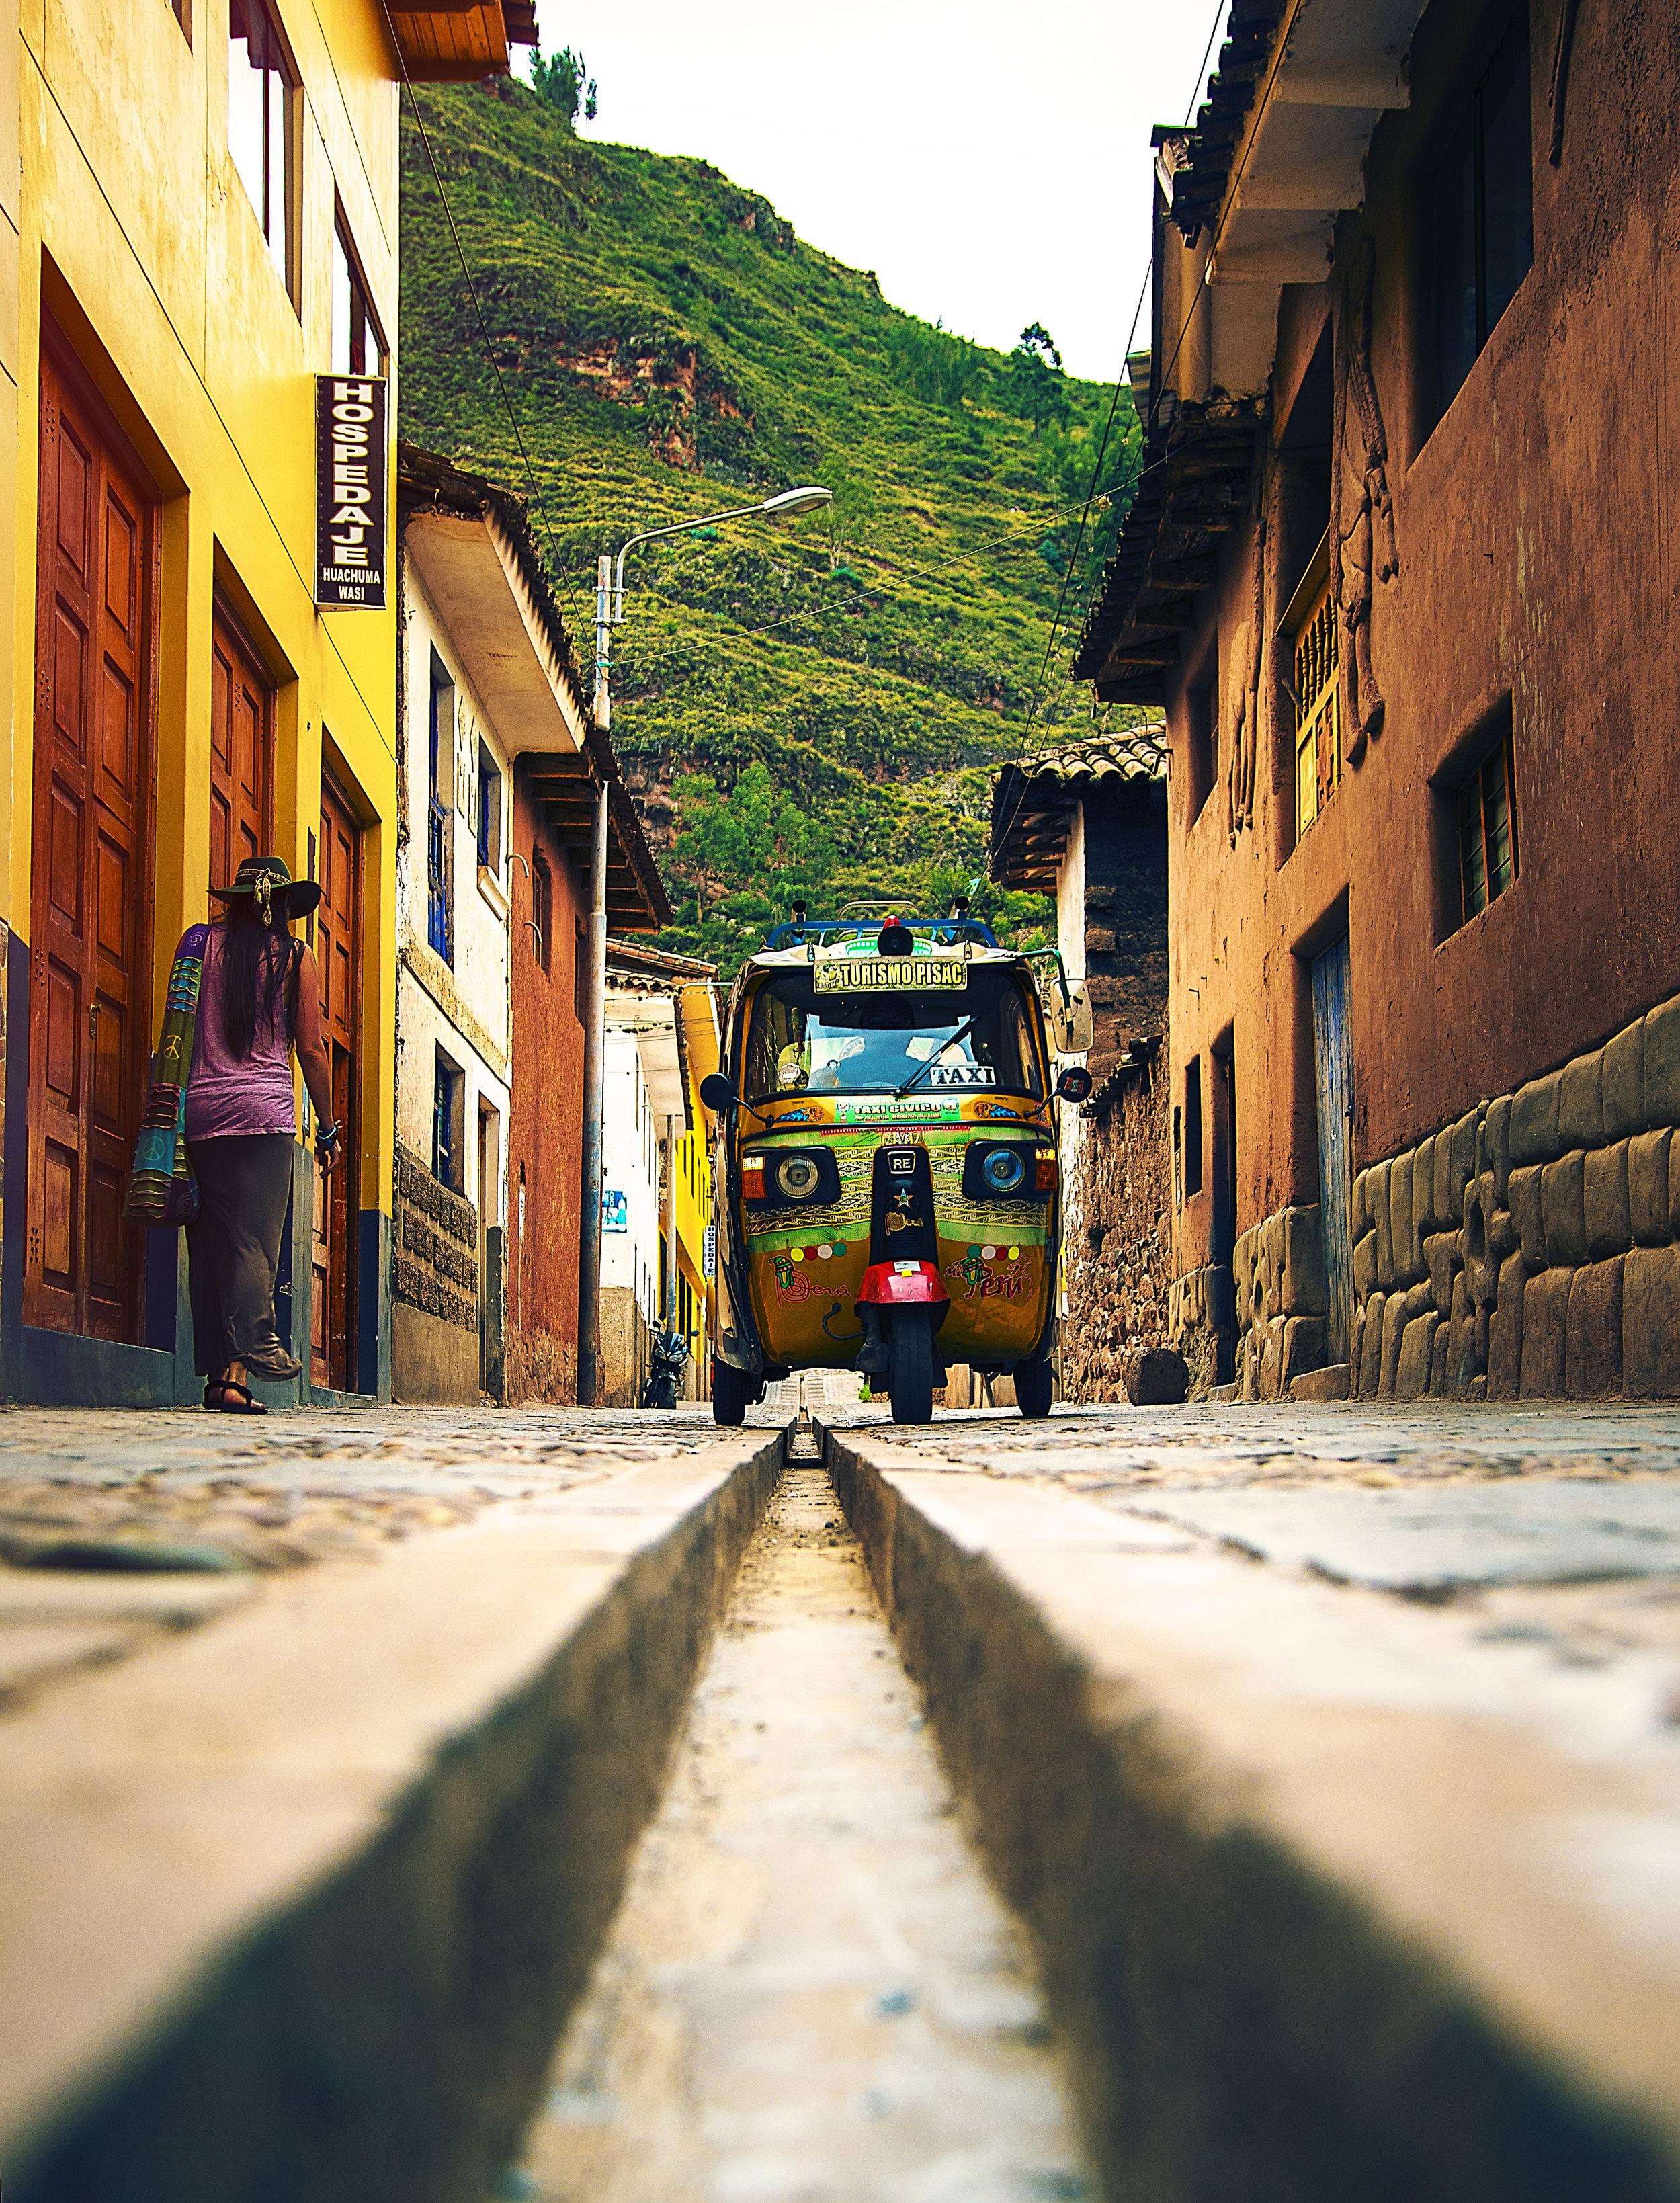 Simon+Needham+Humanitarian+Photography+Peru+6.jpg